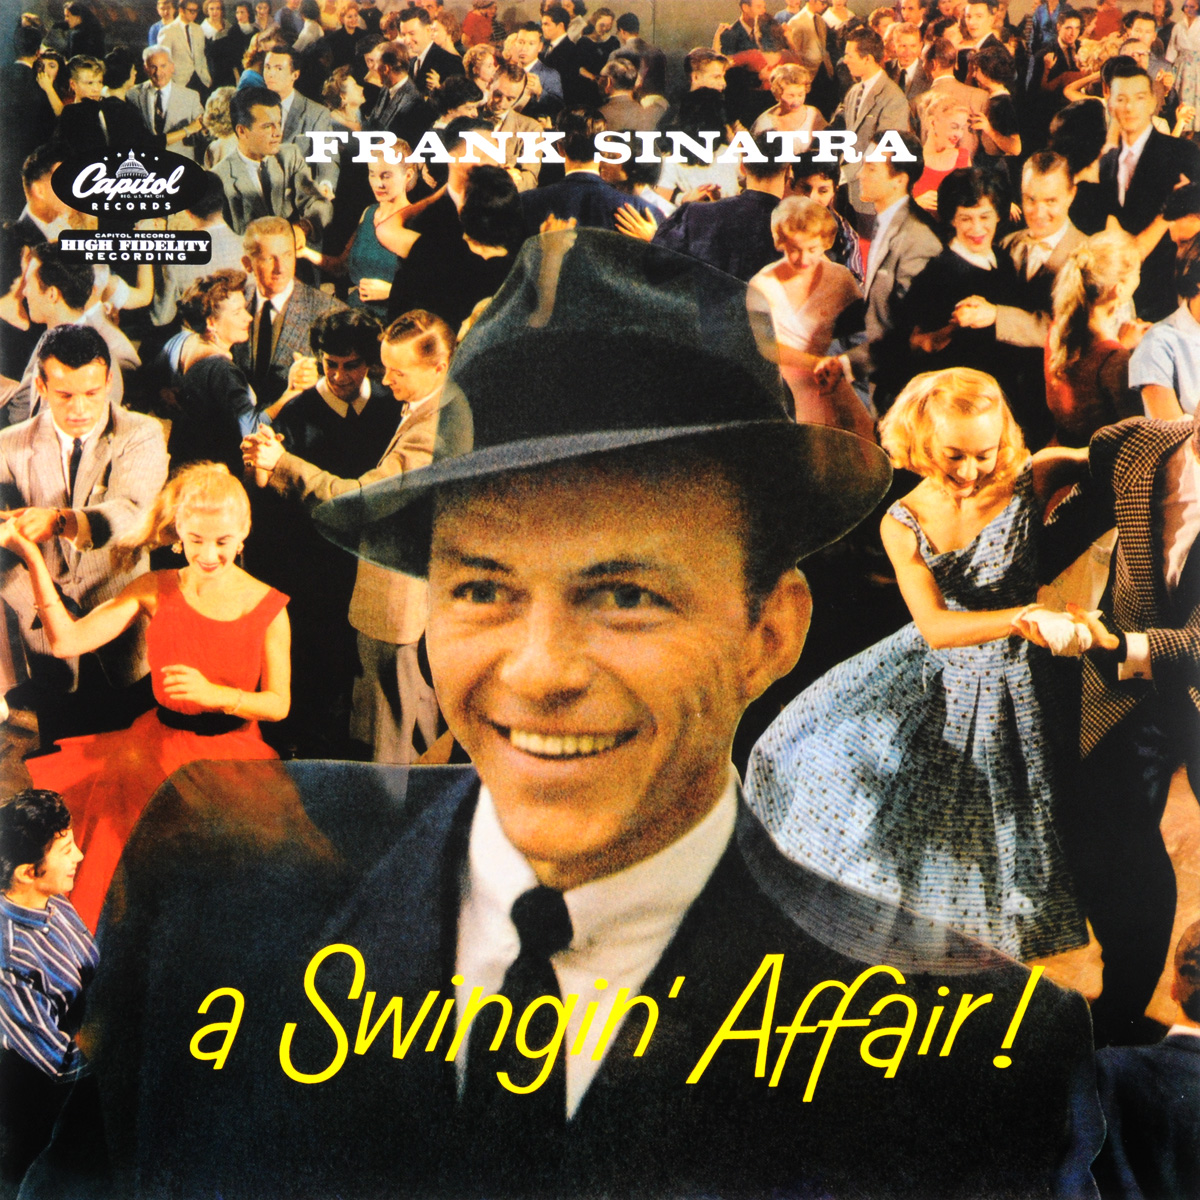 Frank Sinatra. A Swingin' Affair! 60th Anniversary (LP)